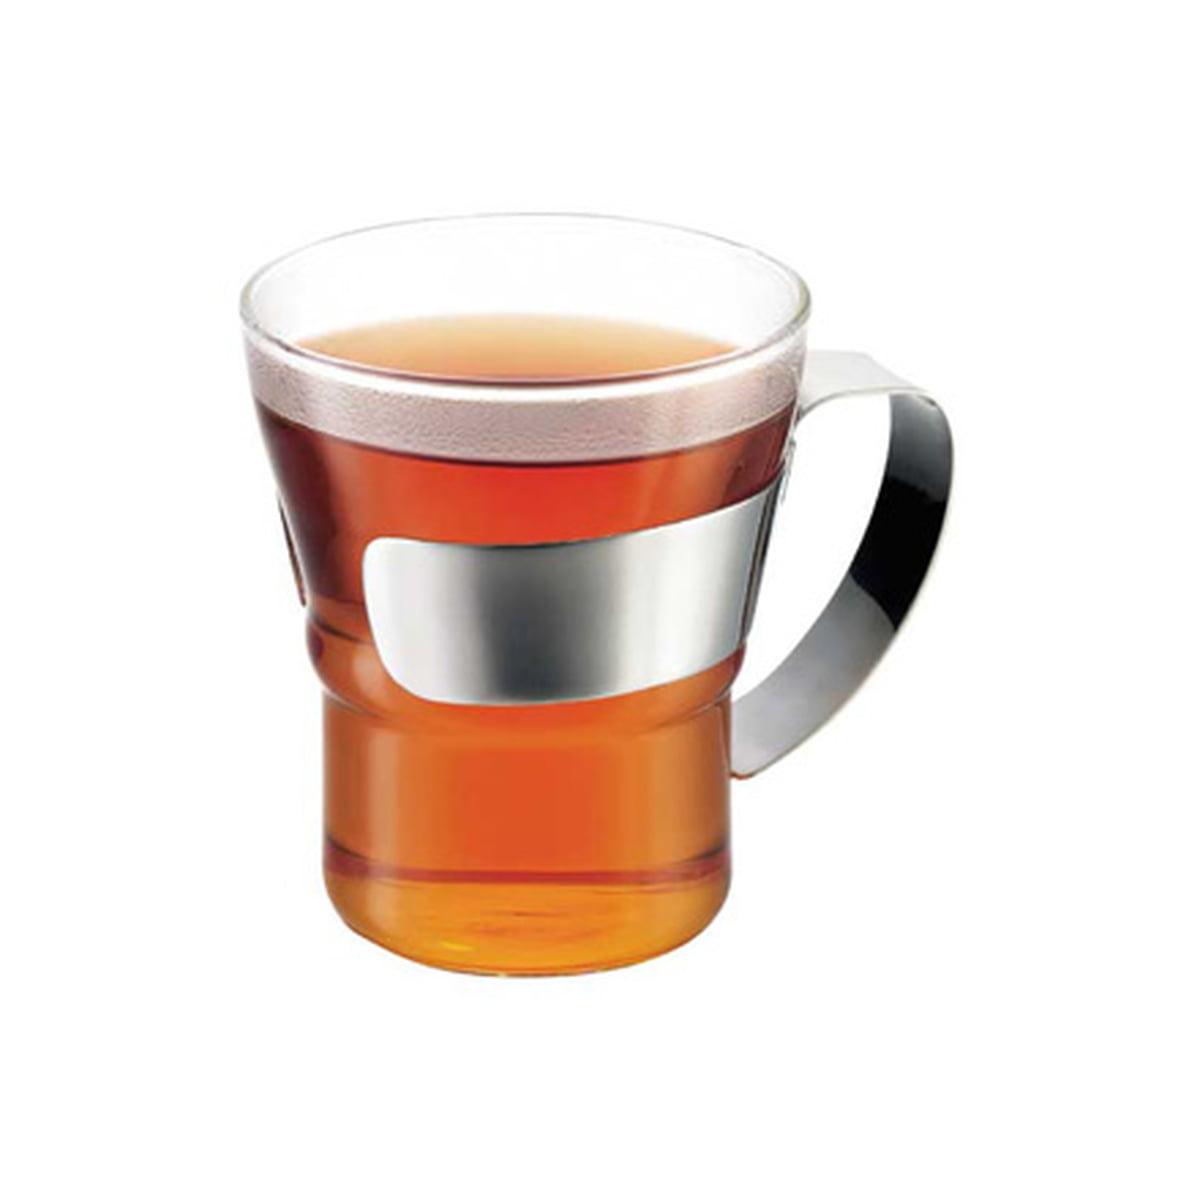 Assam Teeglas mit Edelstahlgriff (2er-Set)